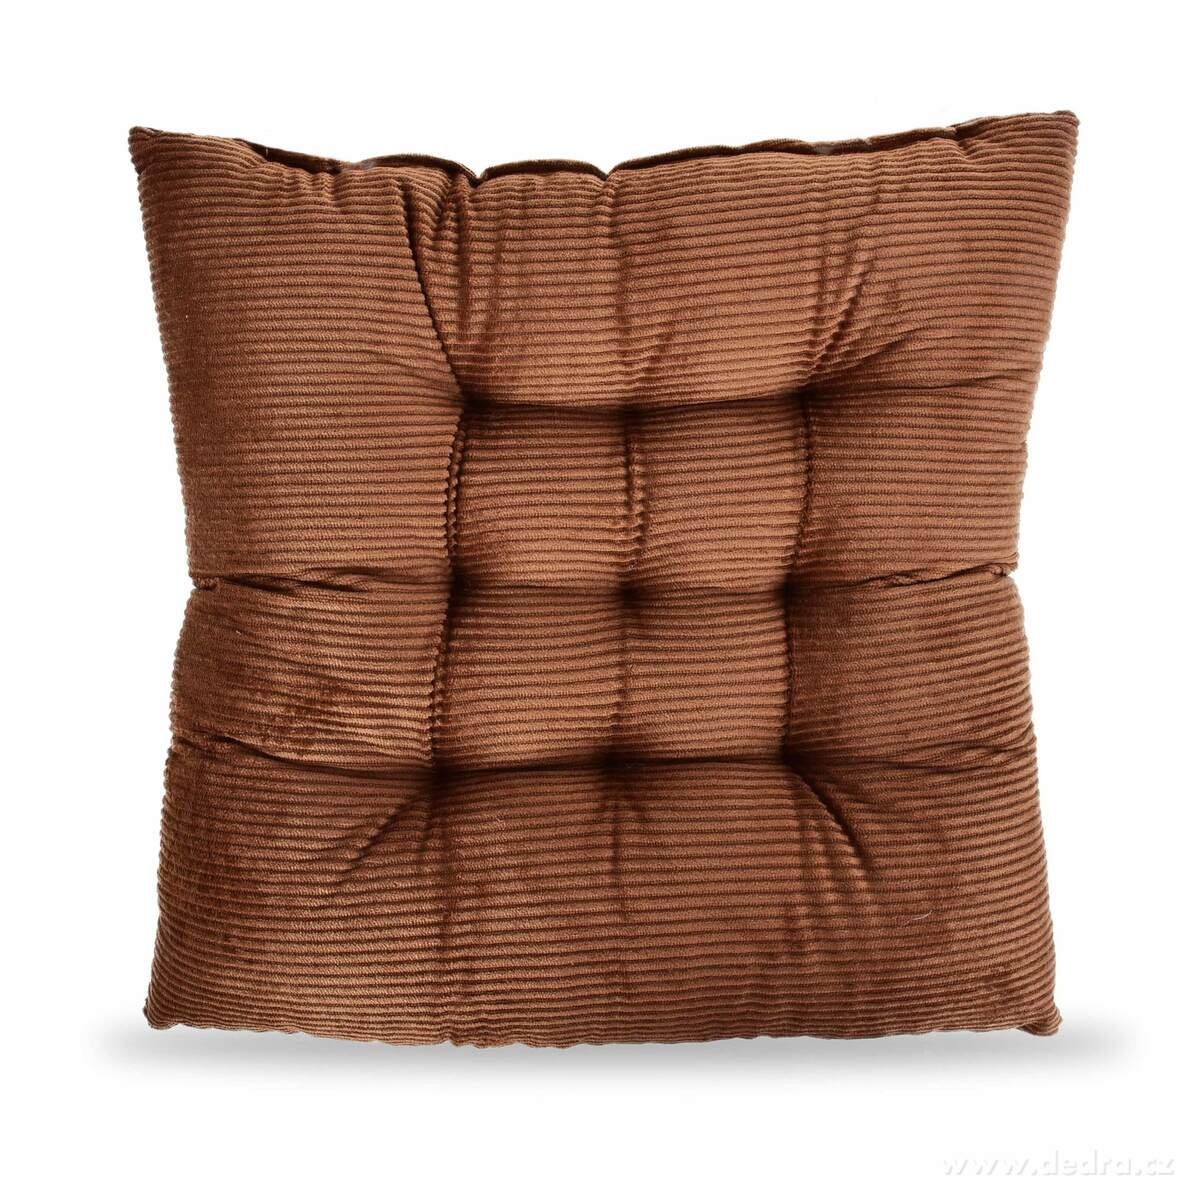 Sedák na stoličky s praktickými šnúrkami